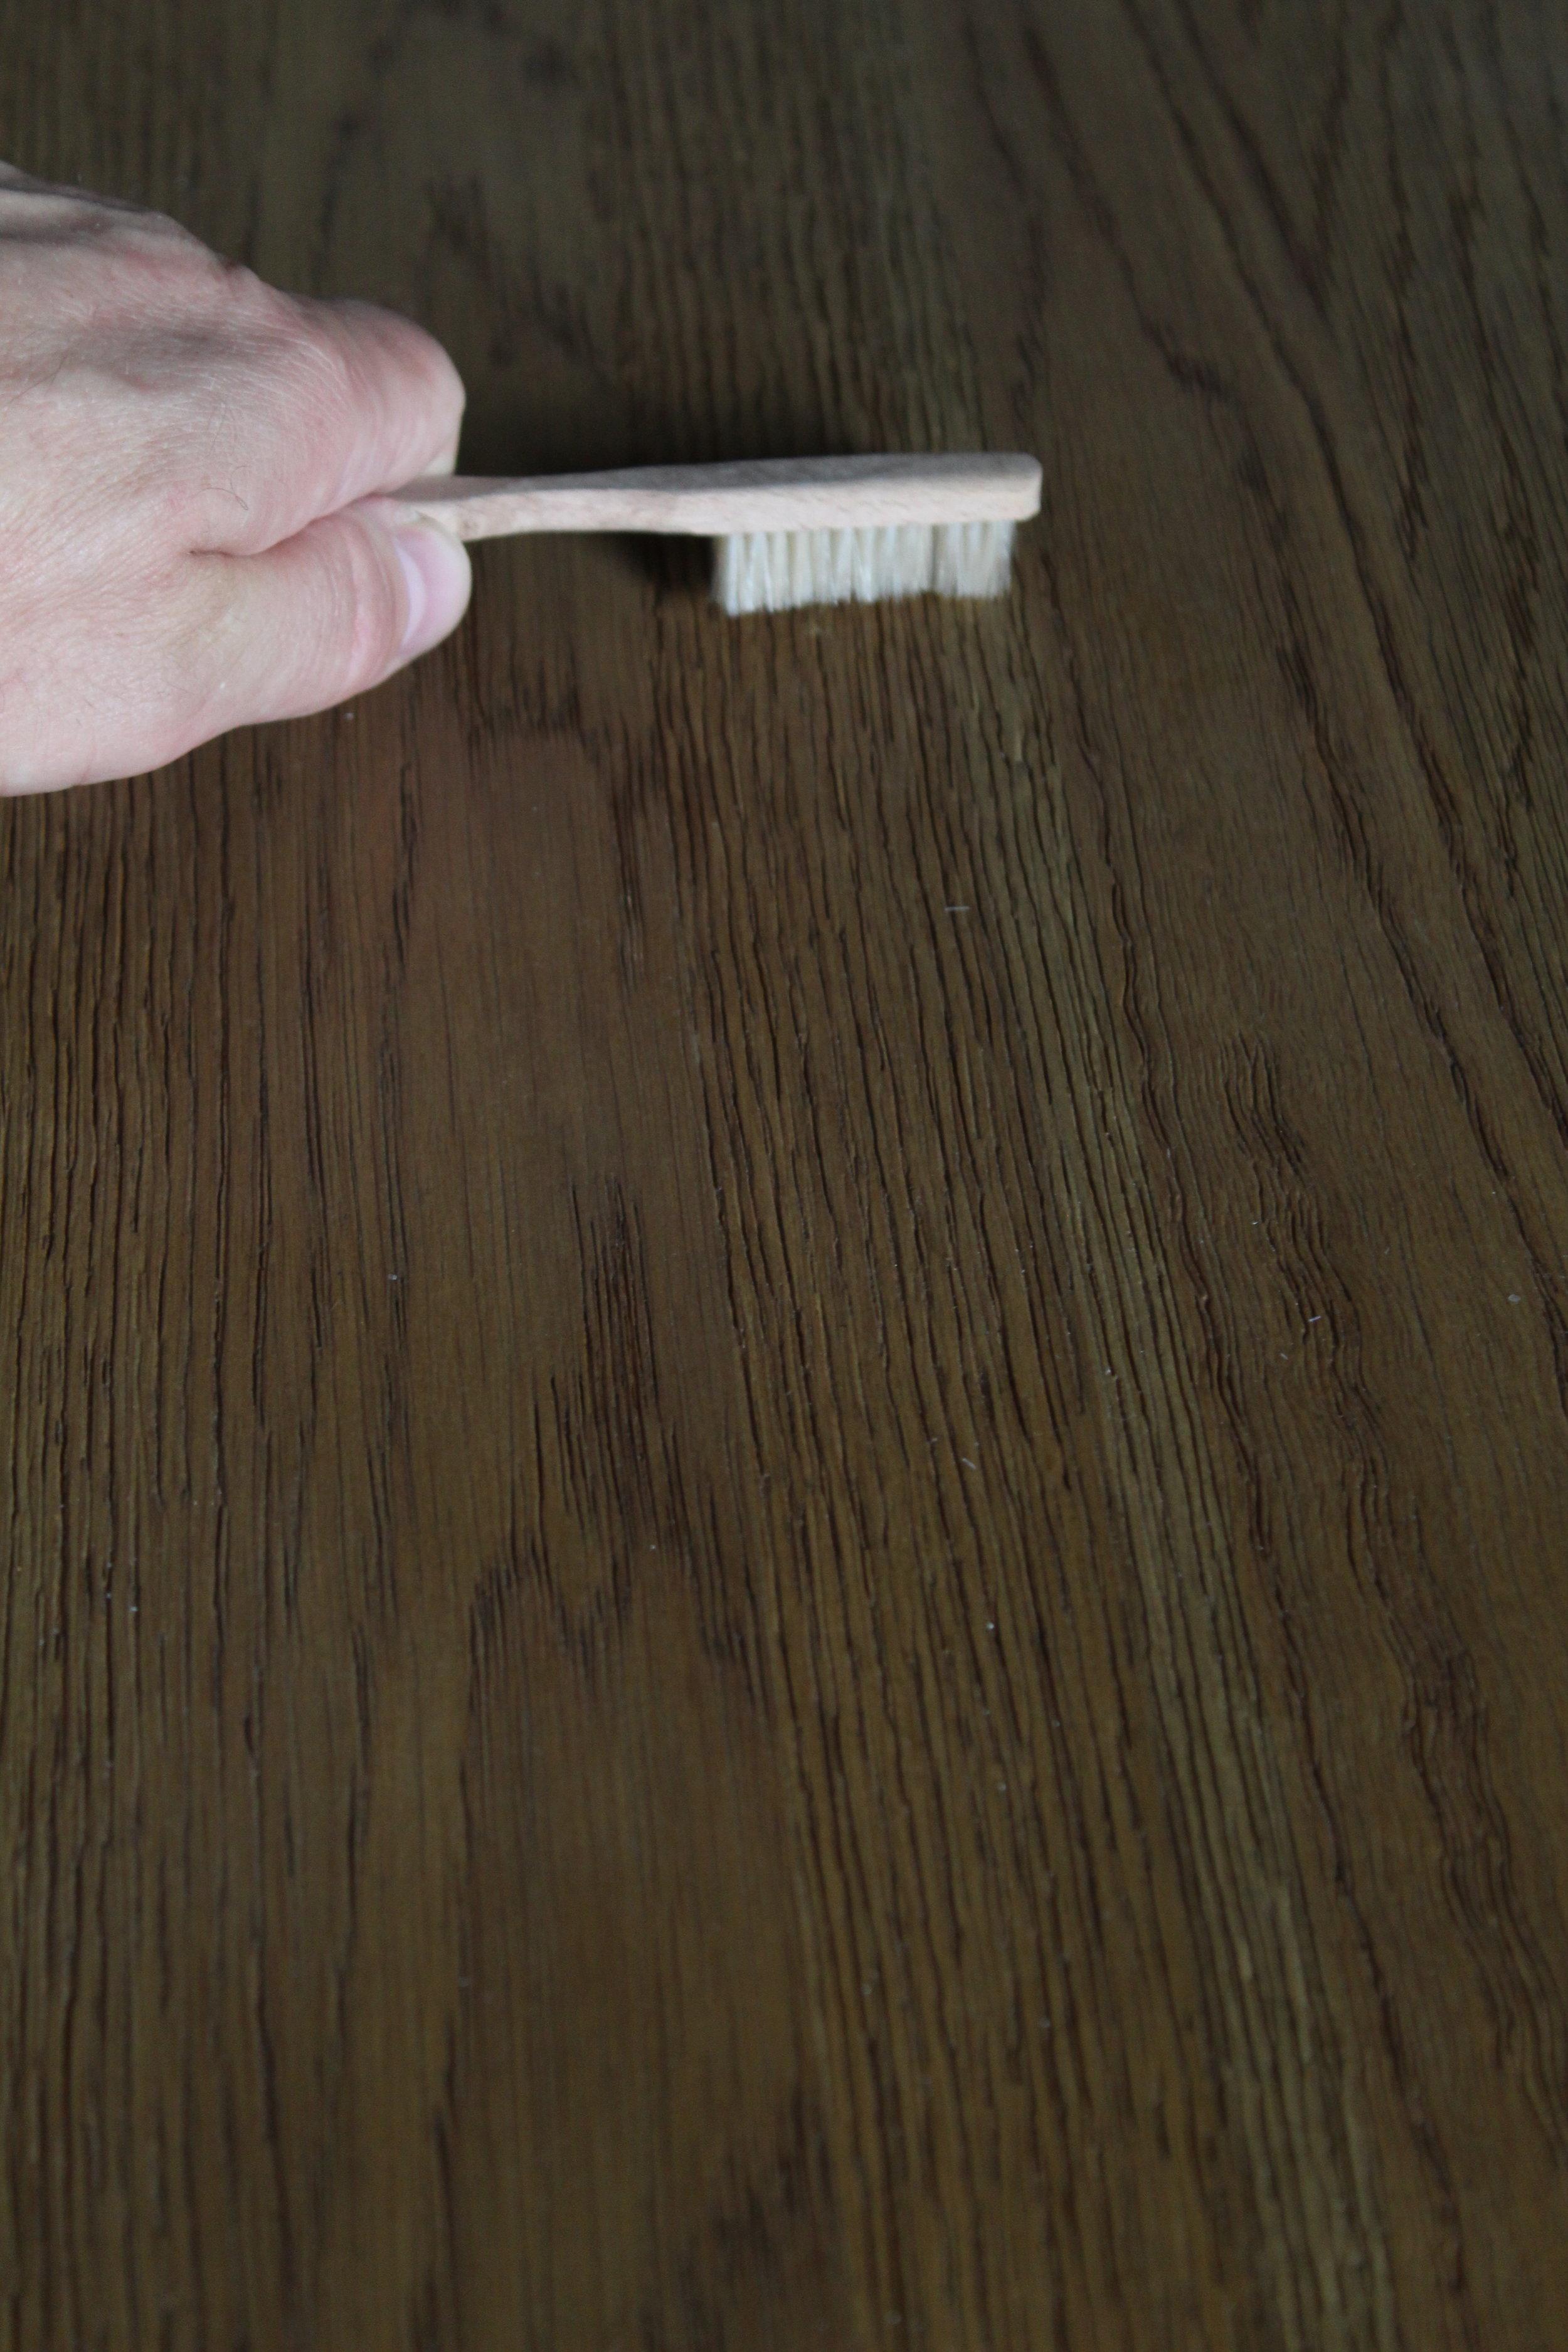 Hand Toothbrush Table.JPG